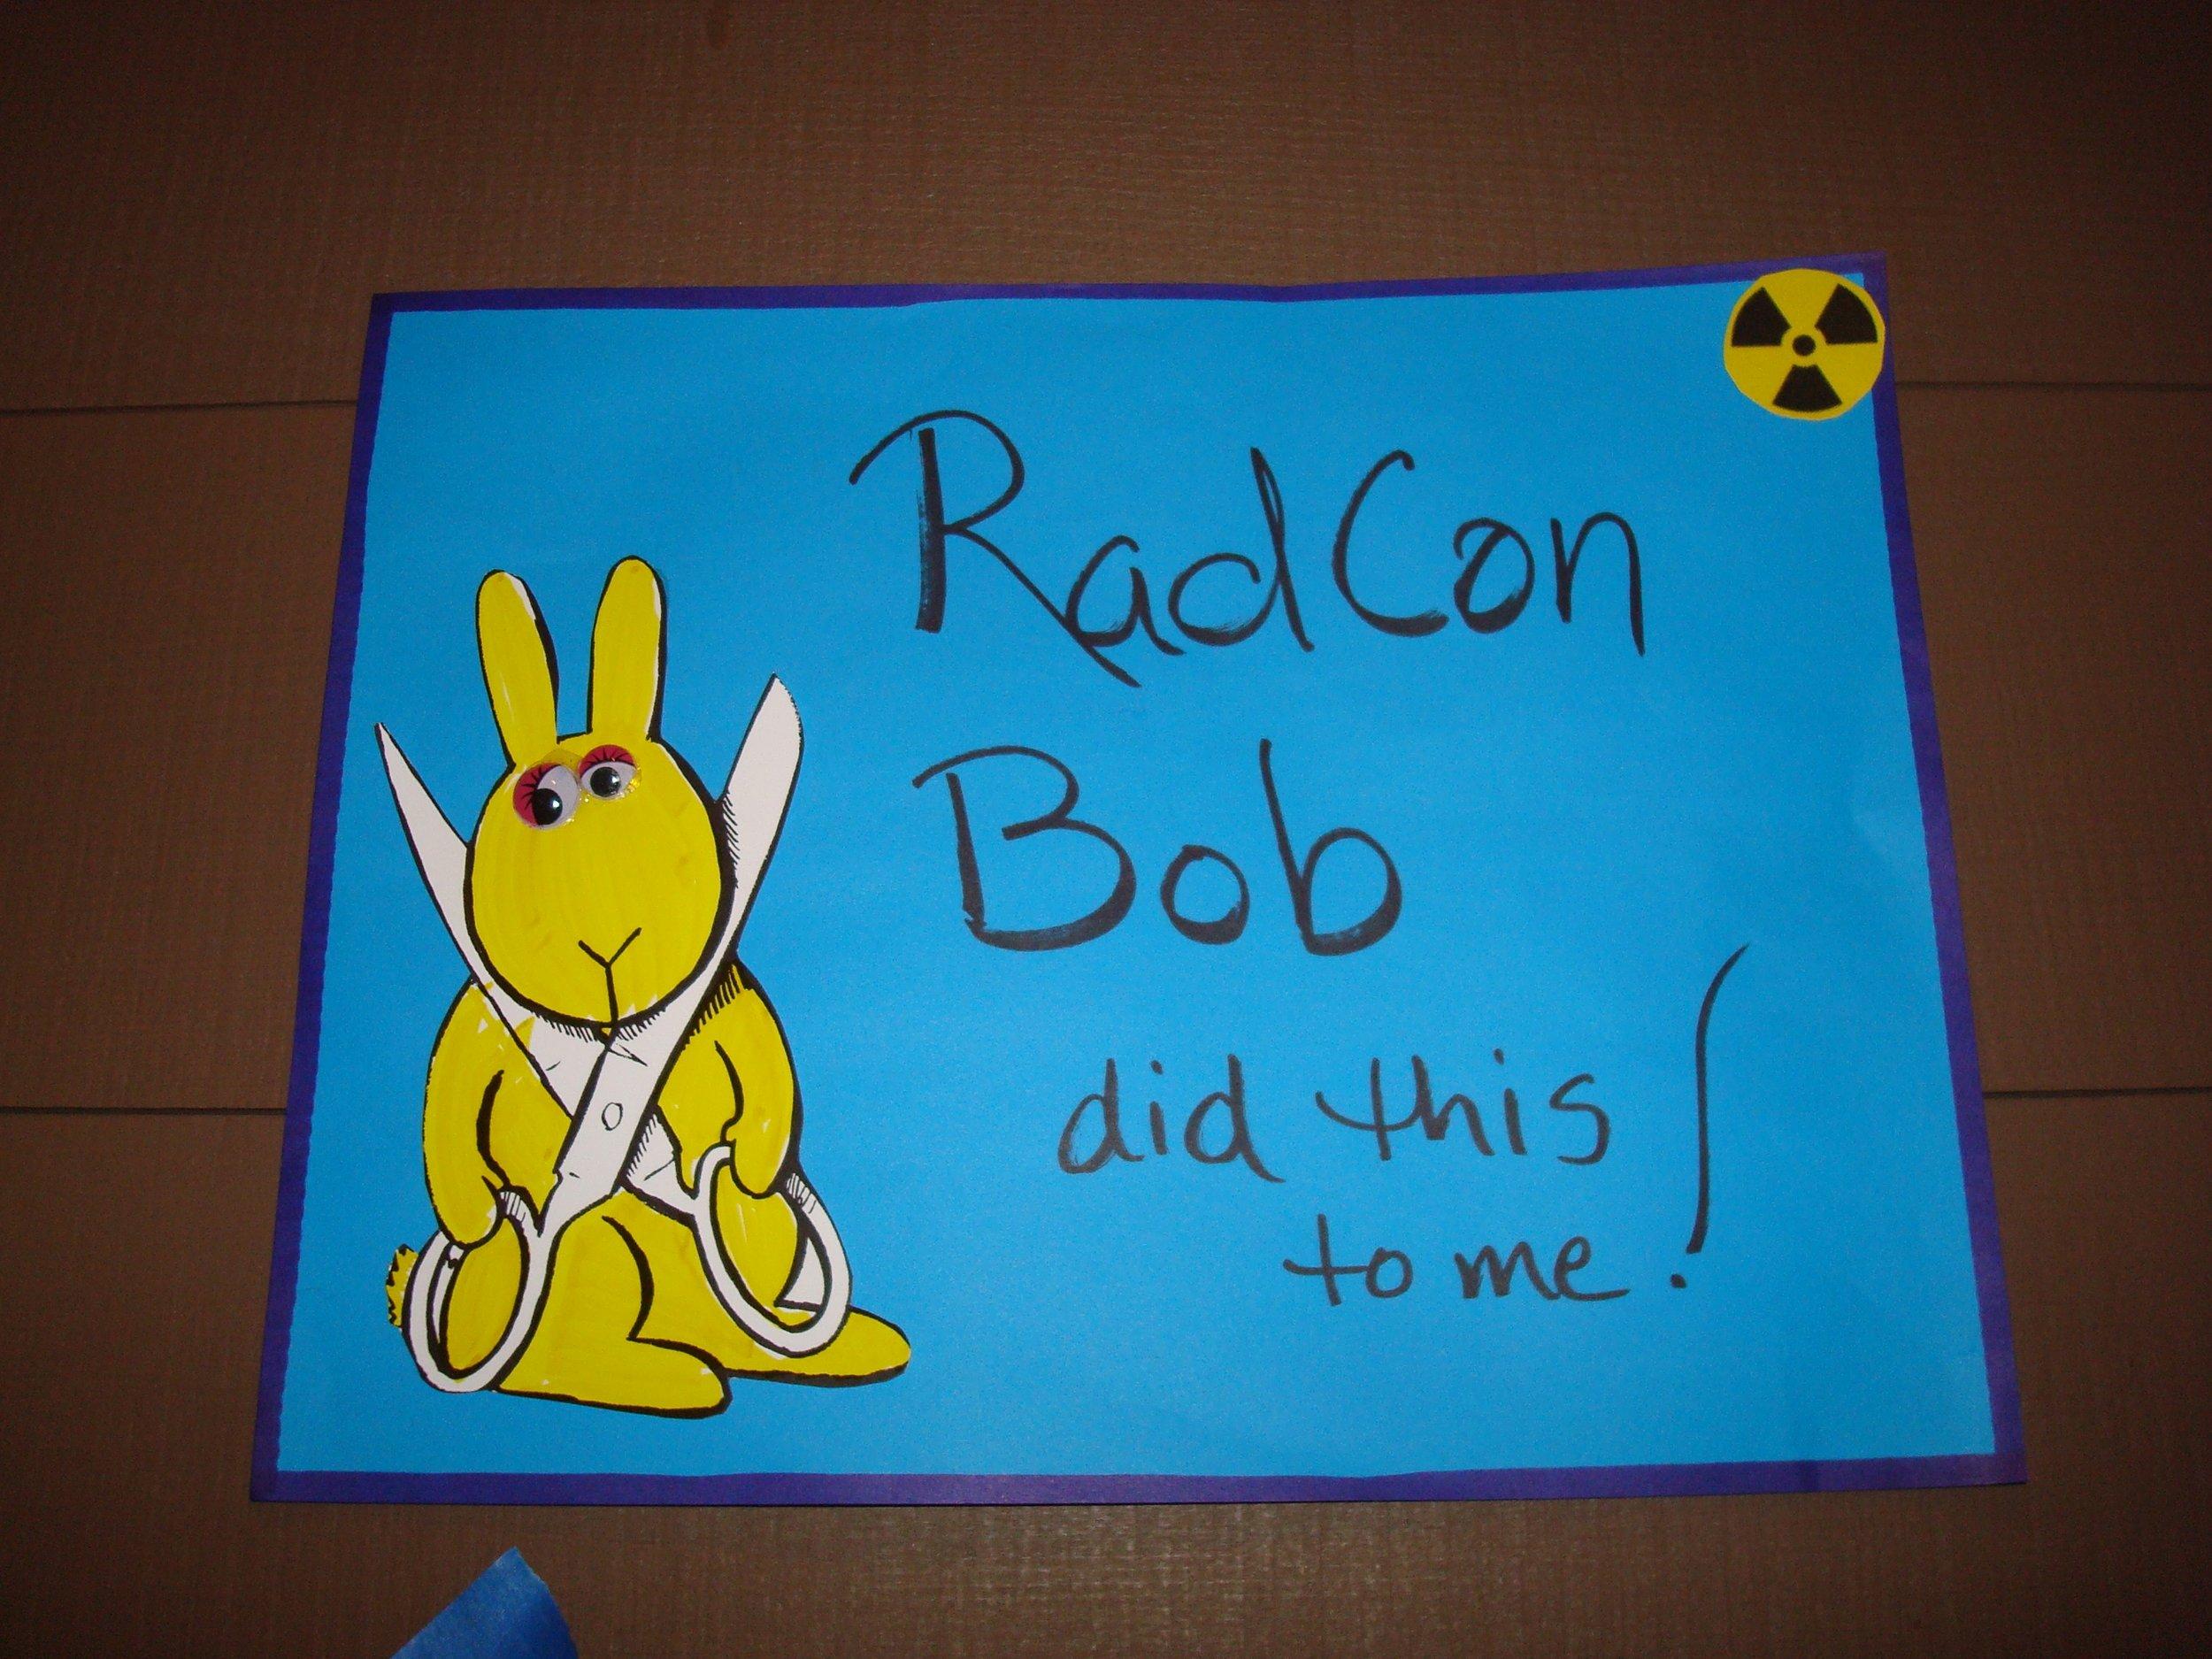 radcon2011-3.jpg